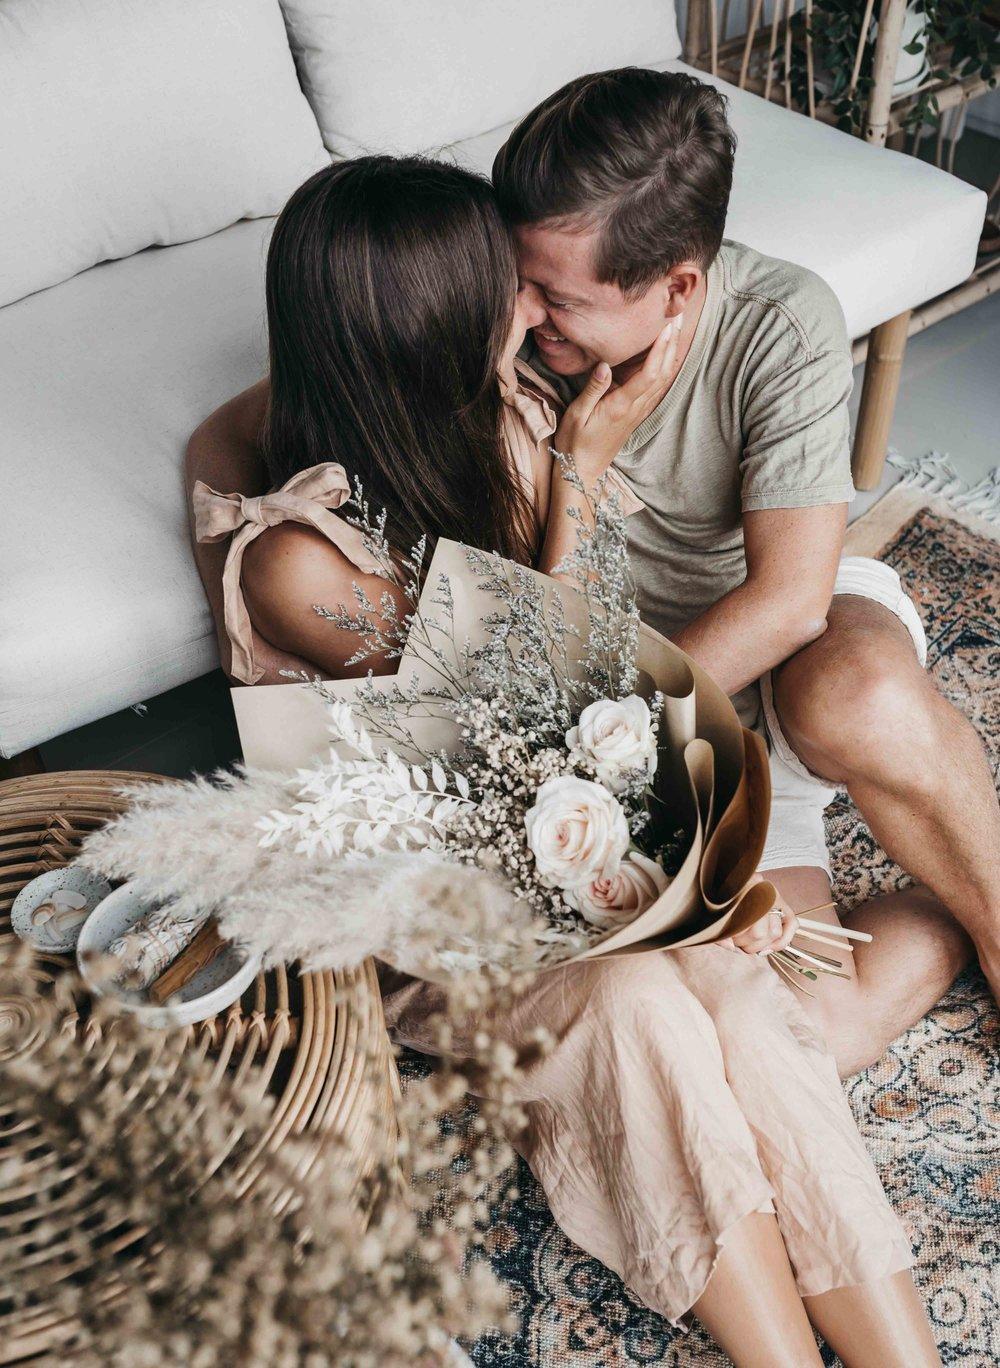 Keira-Mason-Hazel-and-folk-intimate-moment.jpg